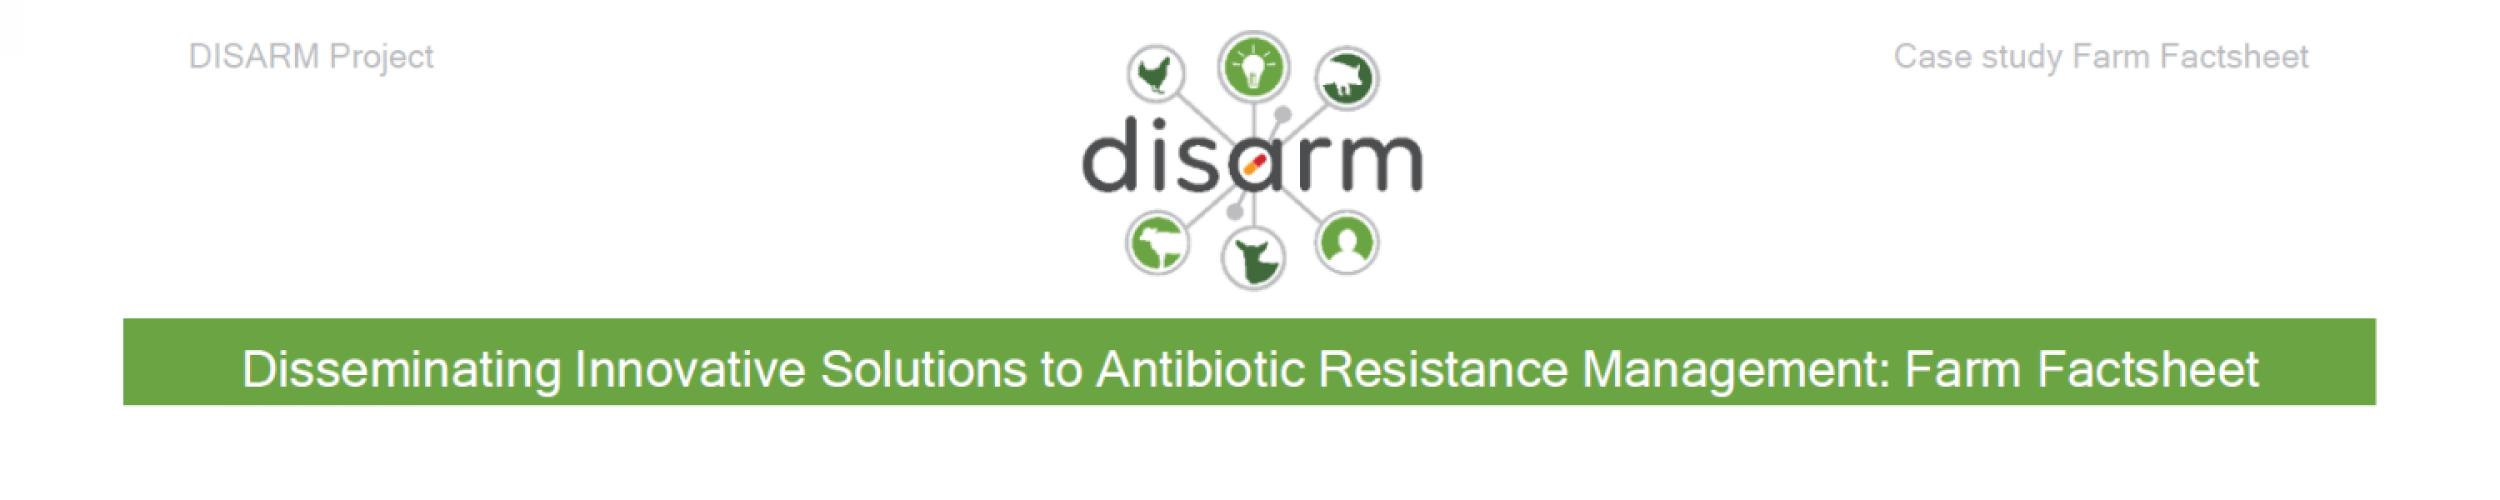 Disseminating Innovative Solutions to Antibiotic Resistance Management: Farm Factsheet